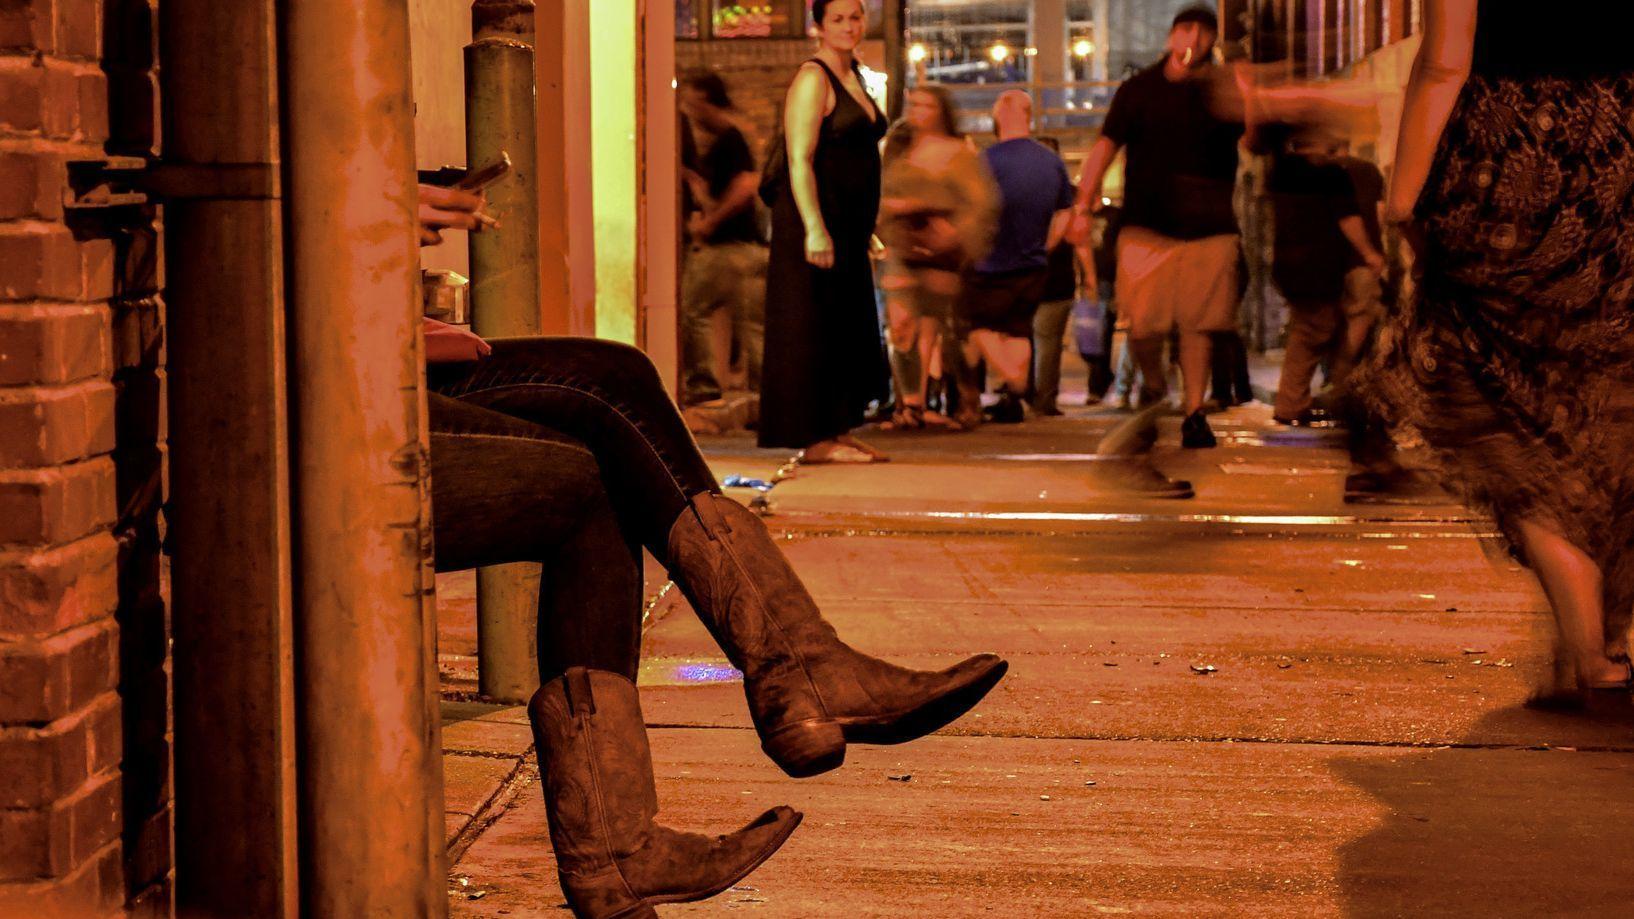 NASHVILLE, TN - Saturday night crowds fill the stress of Nashville's rowdy LoBro district, along Low